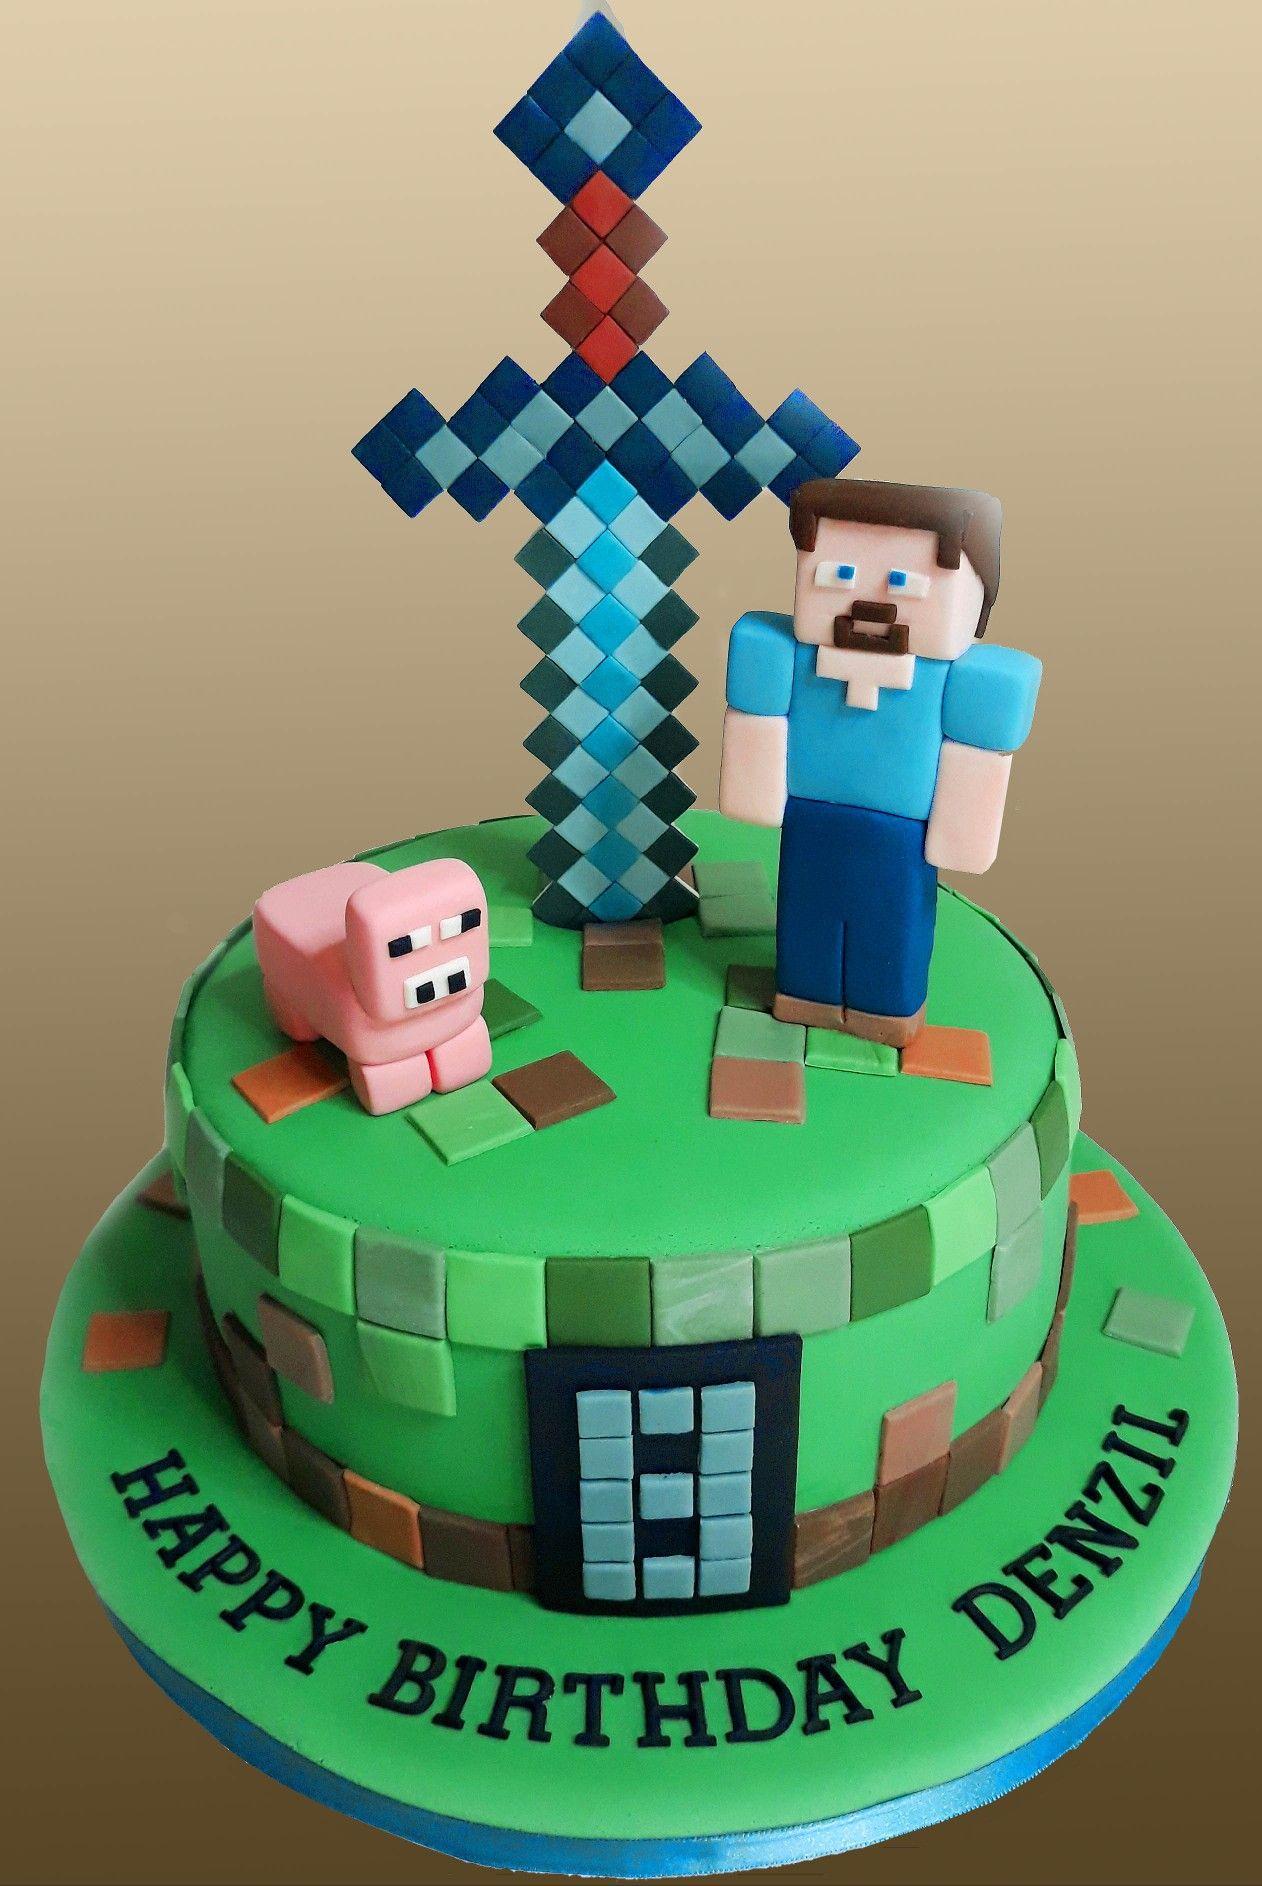 Fondant Minecraft Cake Minecraft Cake Minecraft Birthday Cake